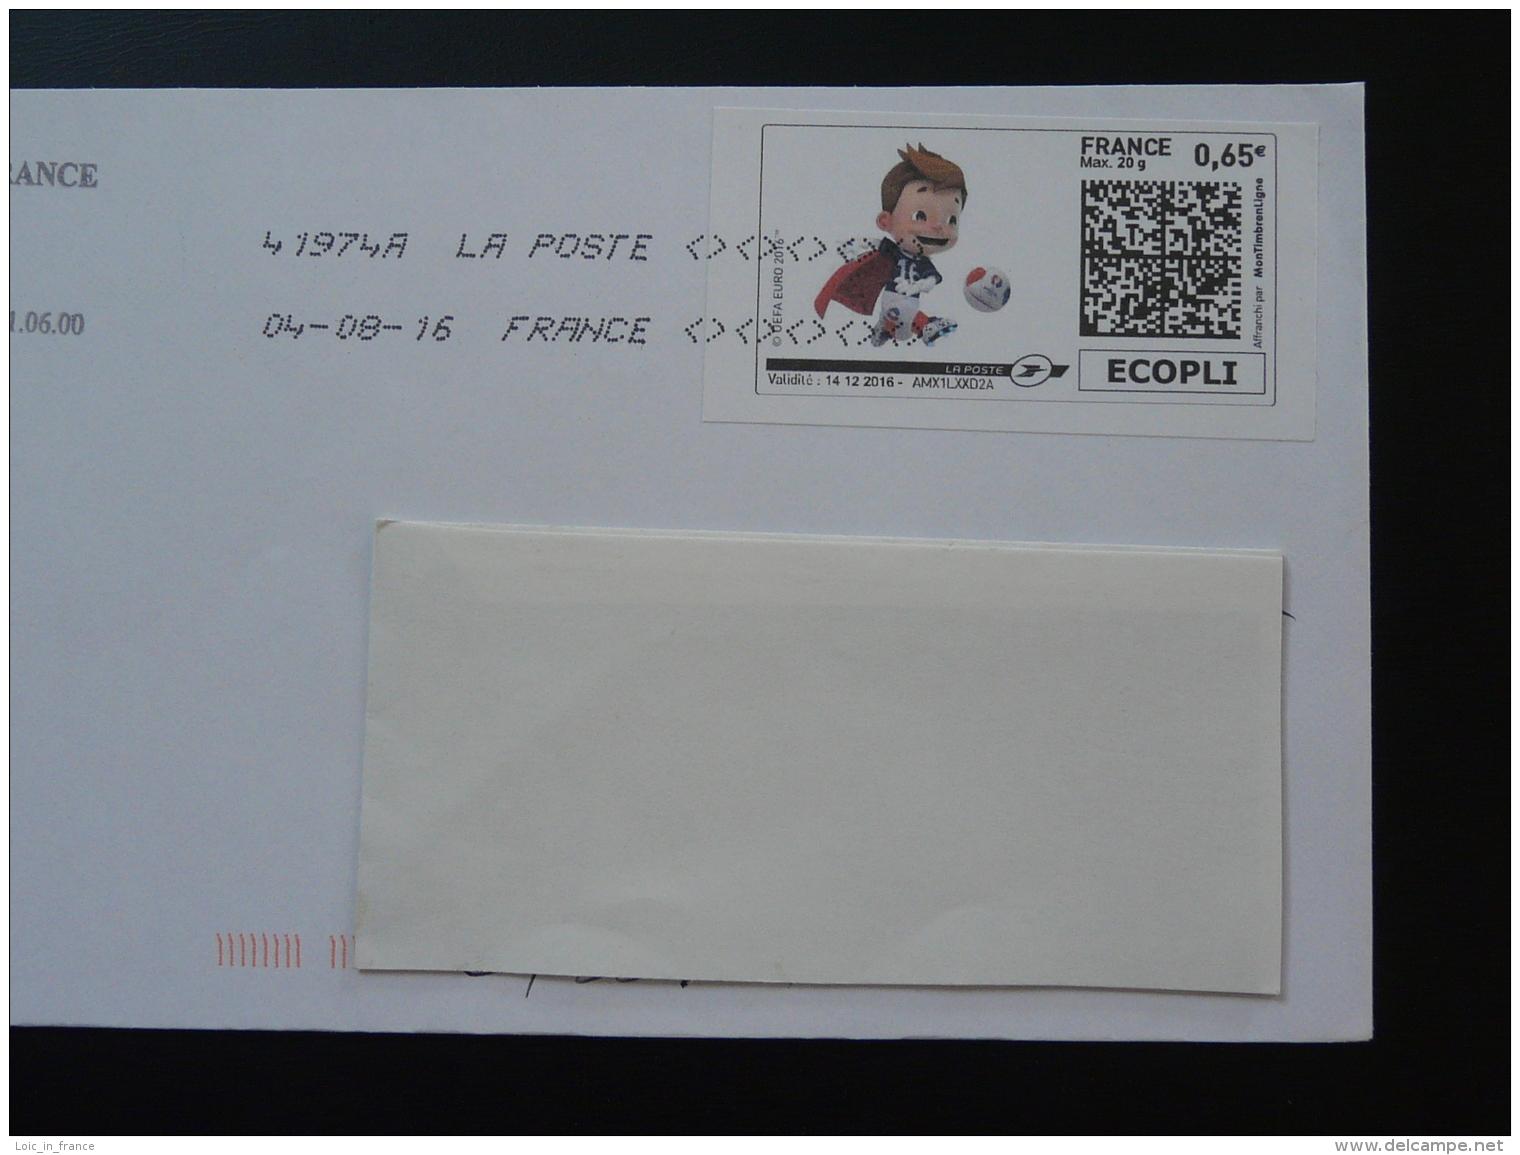 Football UEFA EURO 2016 Timbre En Ligne Sur Lettre (e-stamp On Cover) TPP 3214 - UEFA European Championship